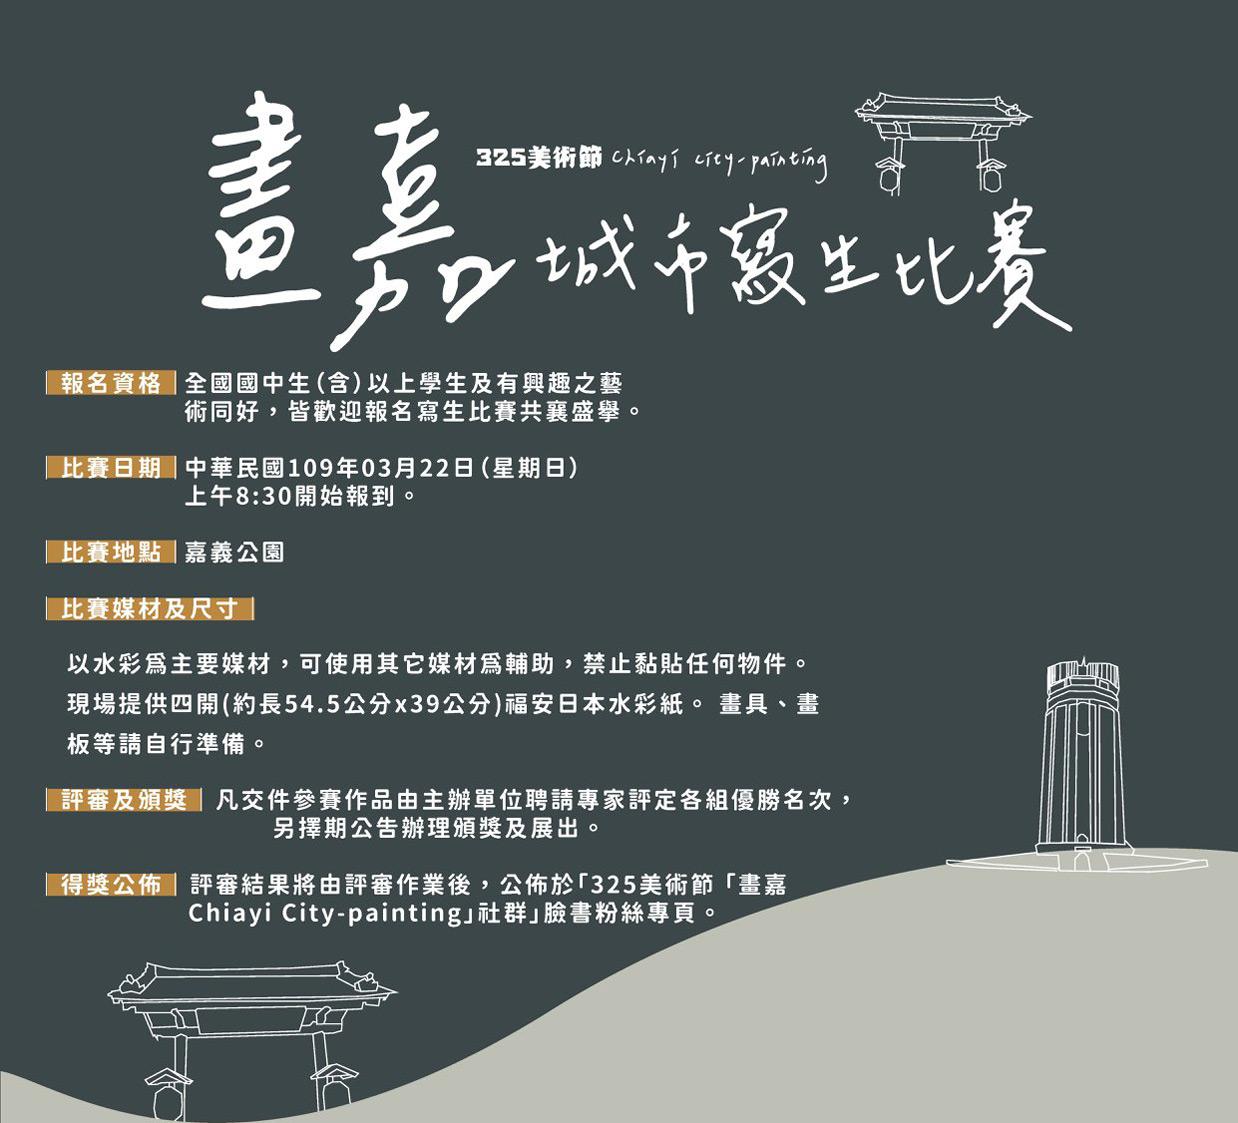 2020「畫嘉-Chiayi-City-painting」城市寫生比賽